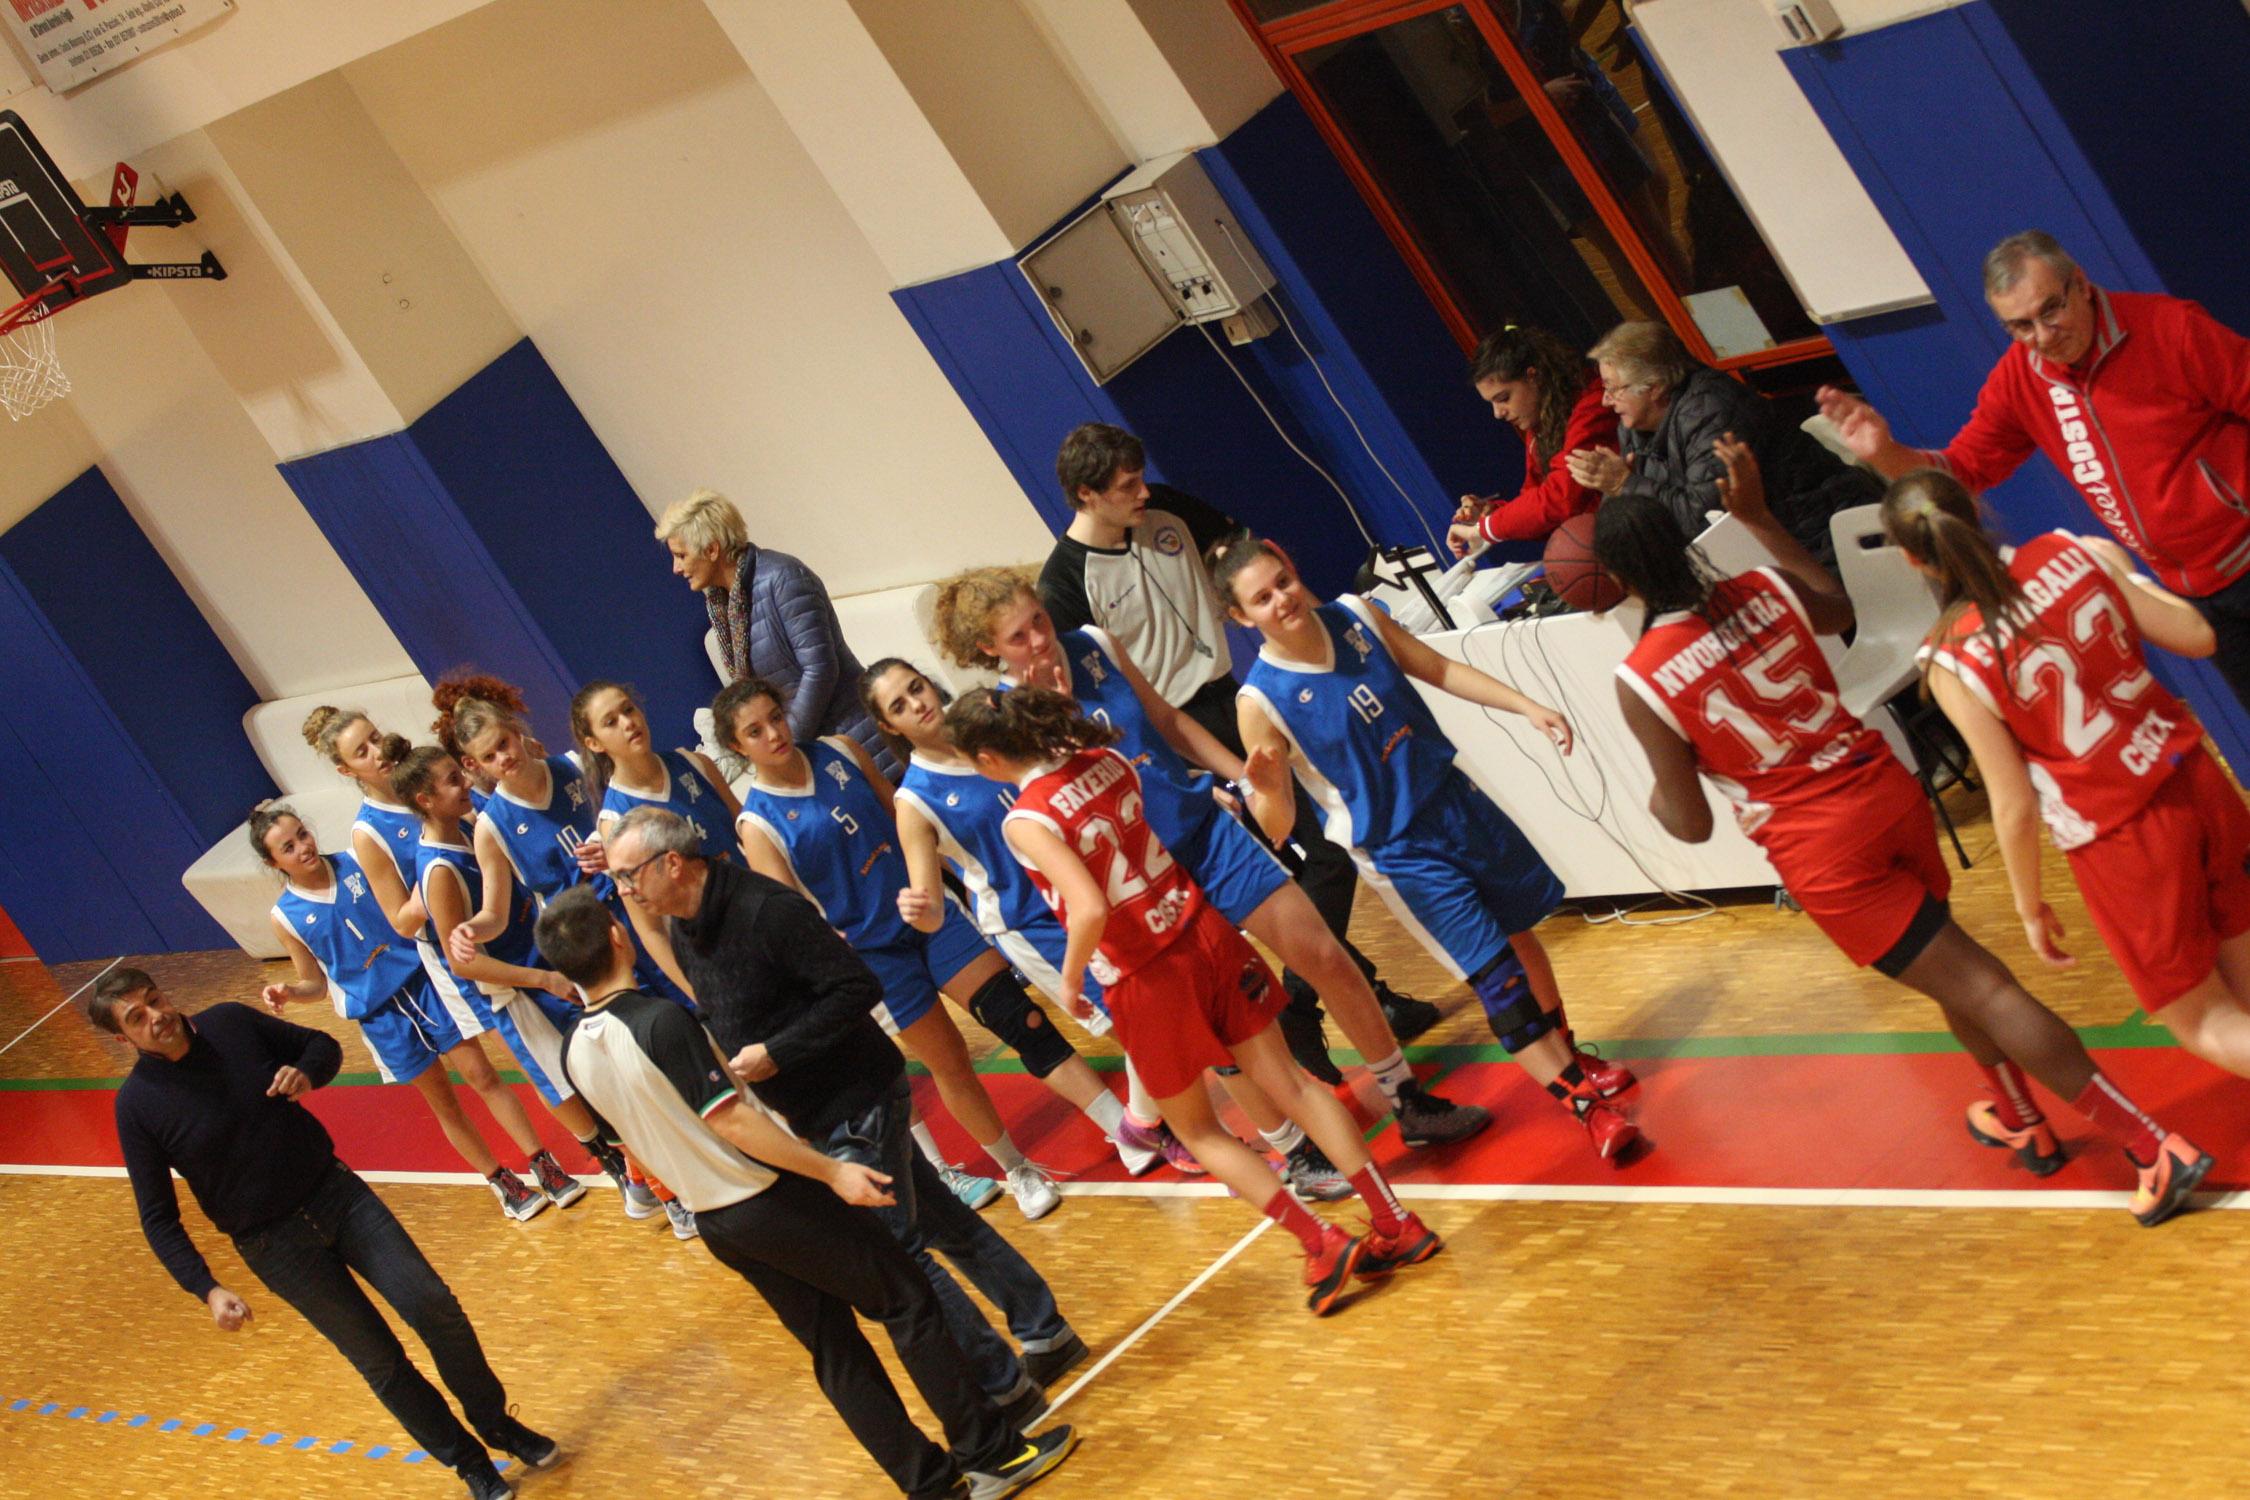 U16E - Costa Masnaga vs Baskettiamo Vittuone 2001 00047.jpg